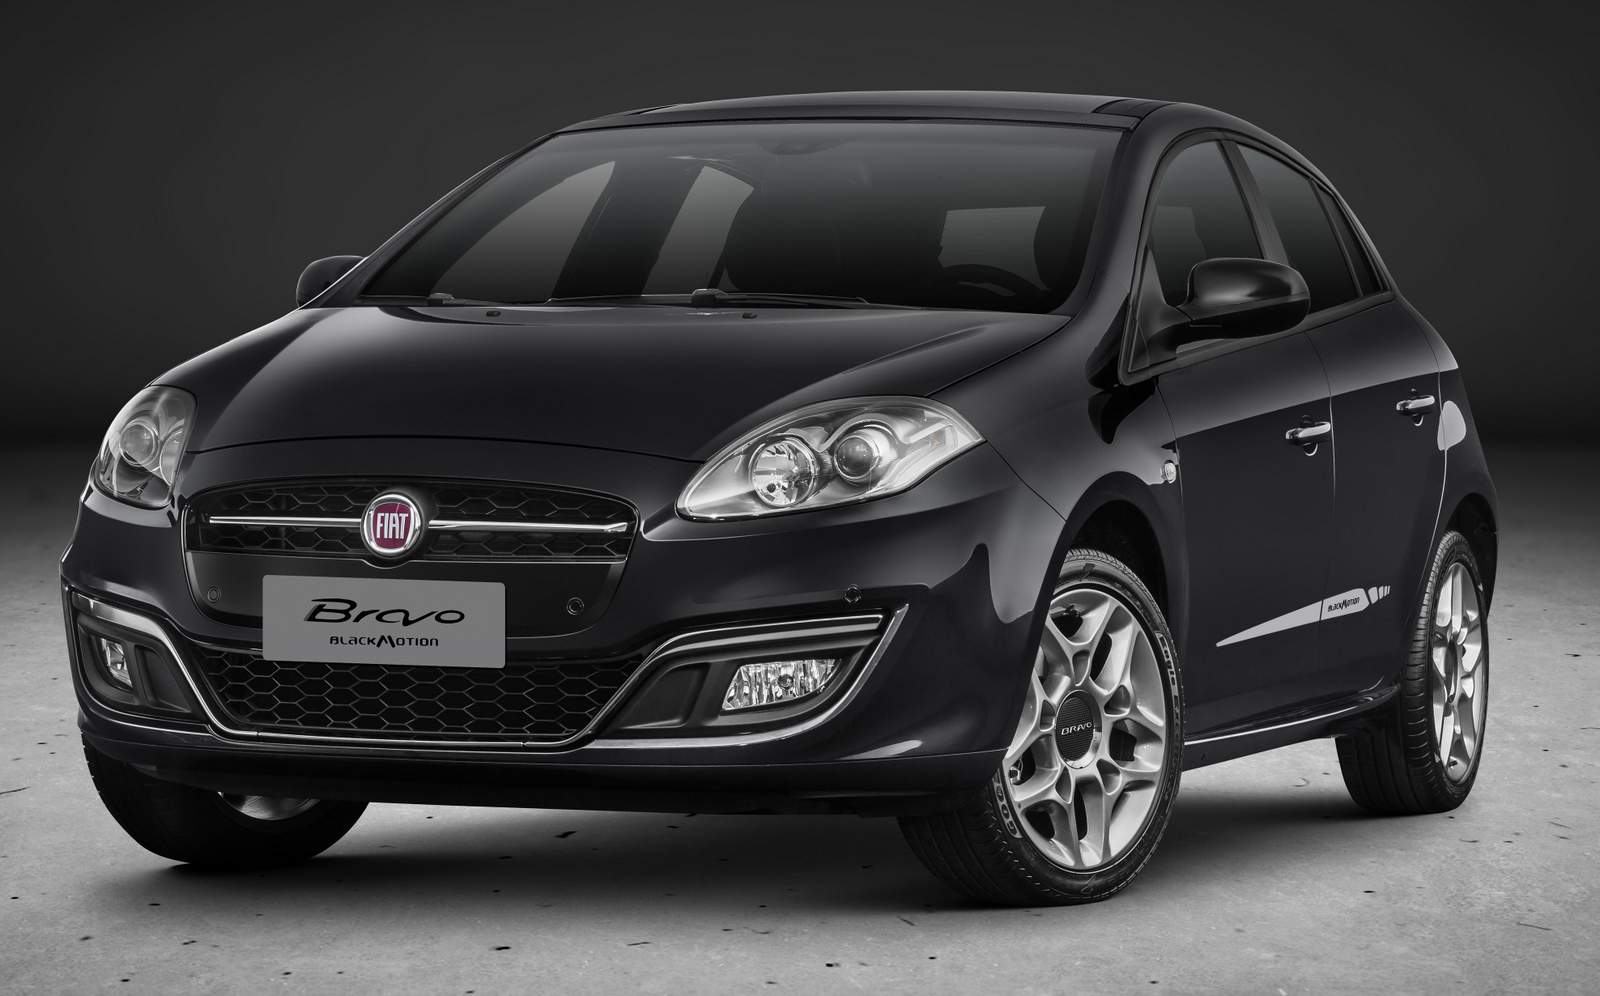 Fiat Bravo 2015